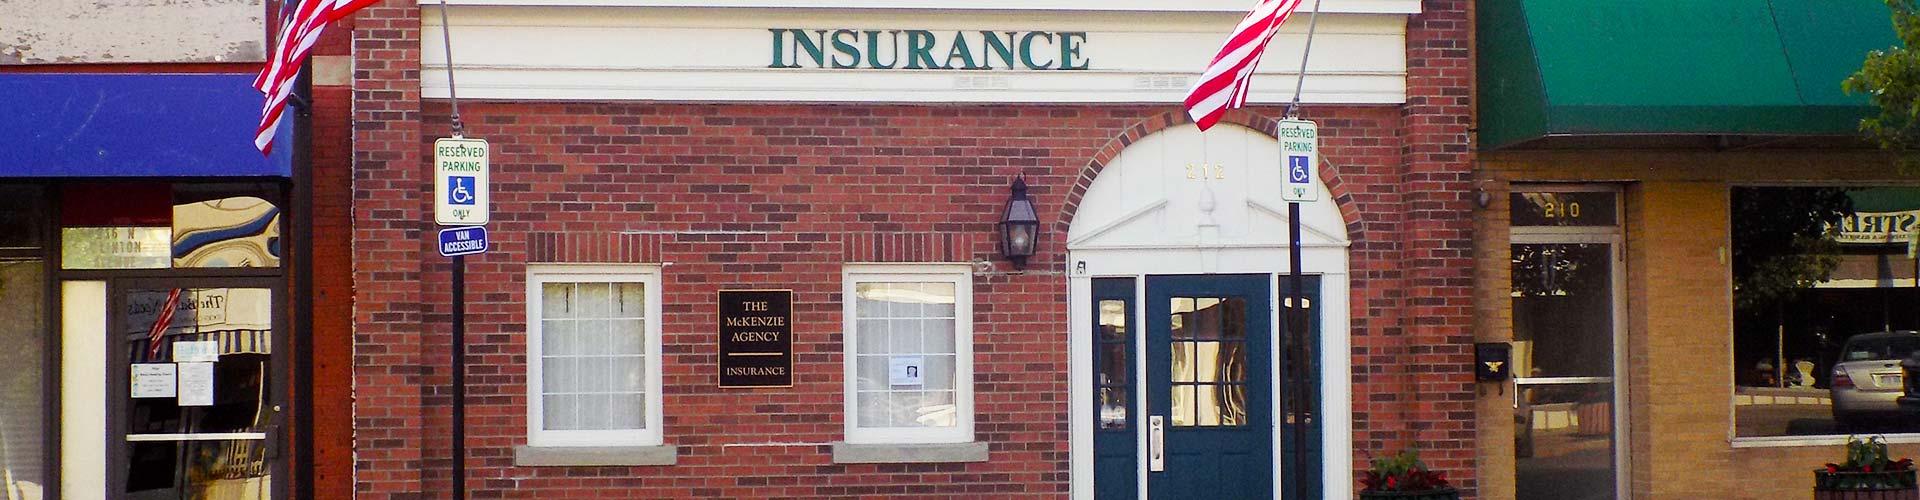 Business Insurance Michigan State Home Insurance Clinton